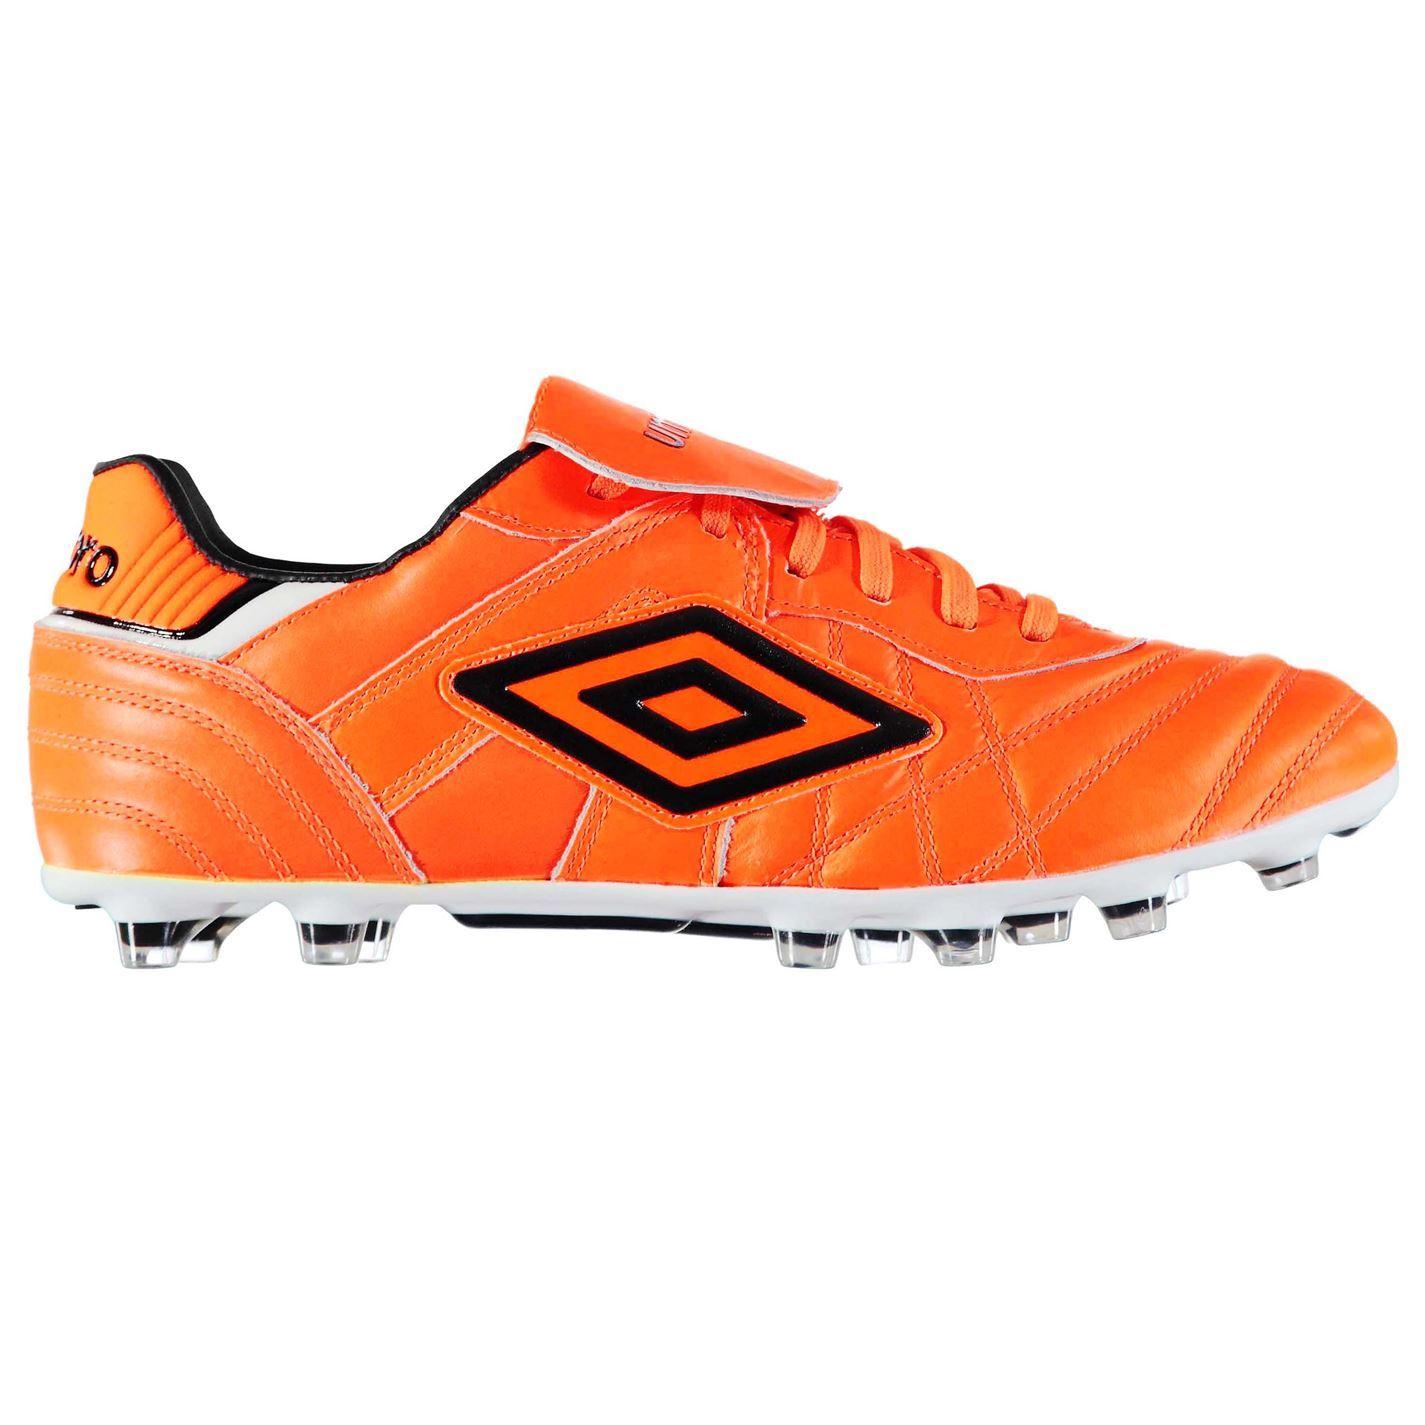 Umbro  Herren Gents Speciali Eternal Pro Pro Eternal HG Football Stiefel Footwear Laces Fastened 423c8c